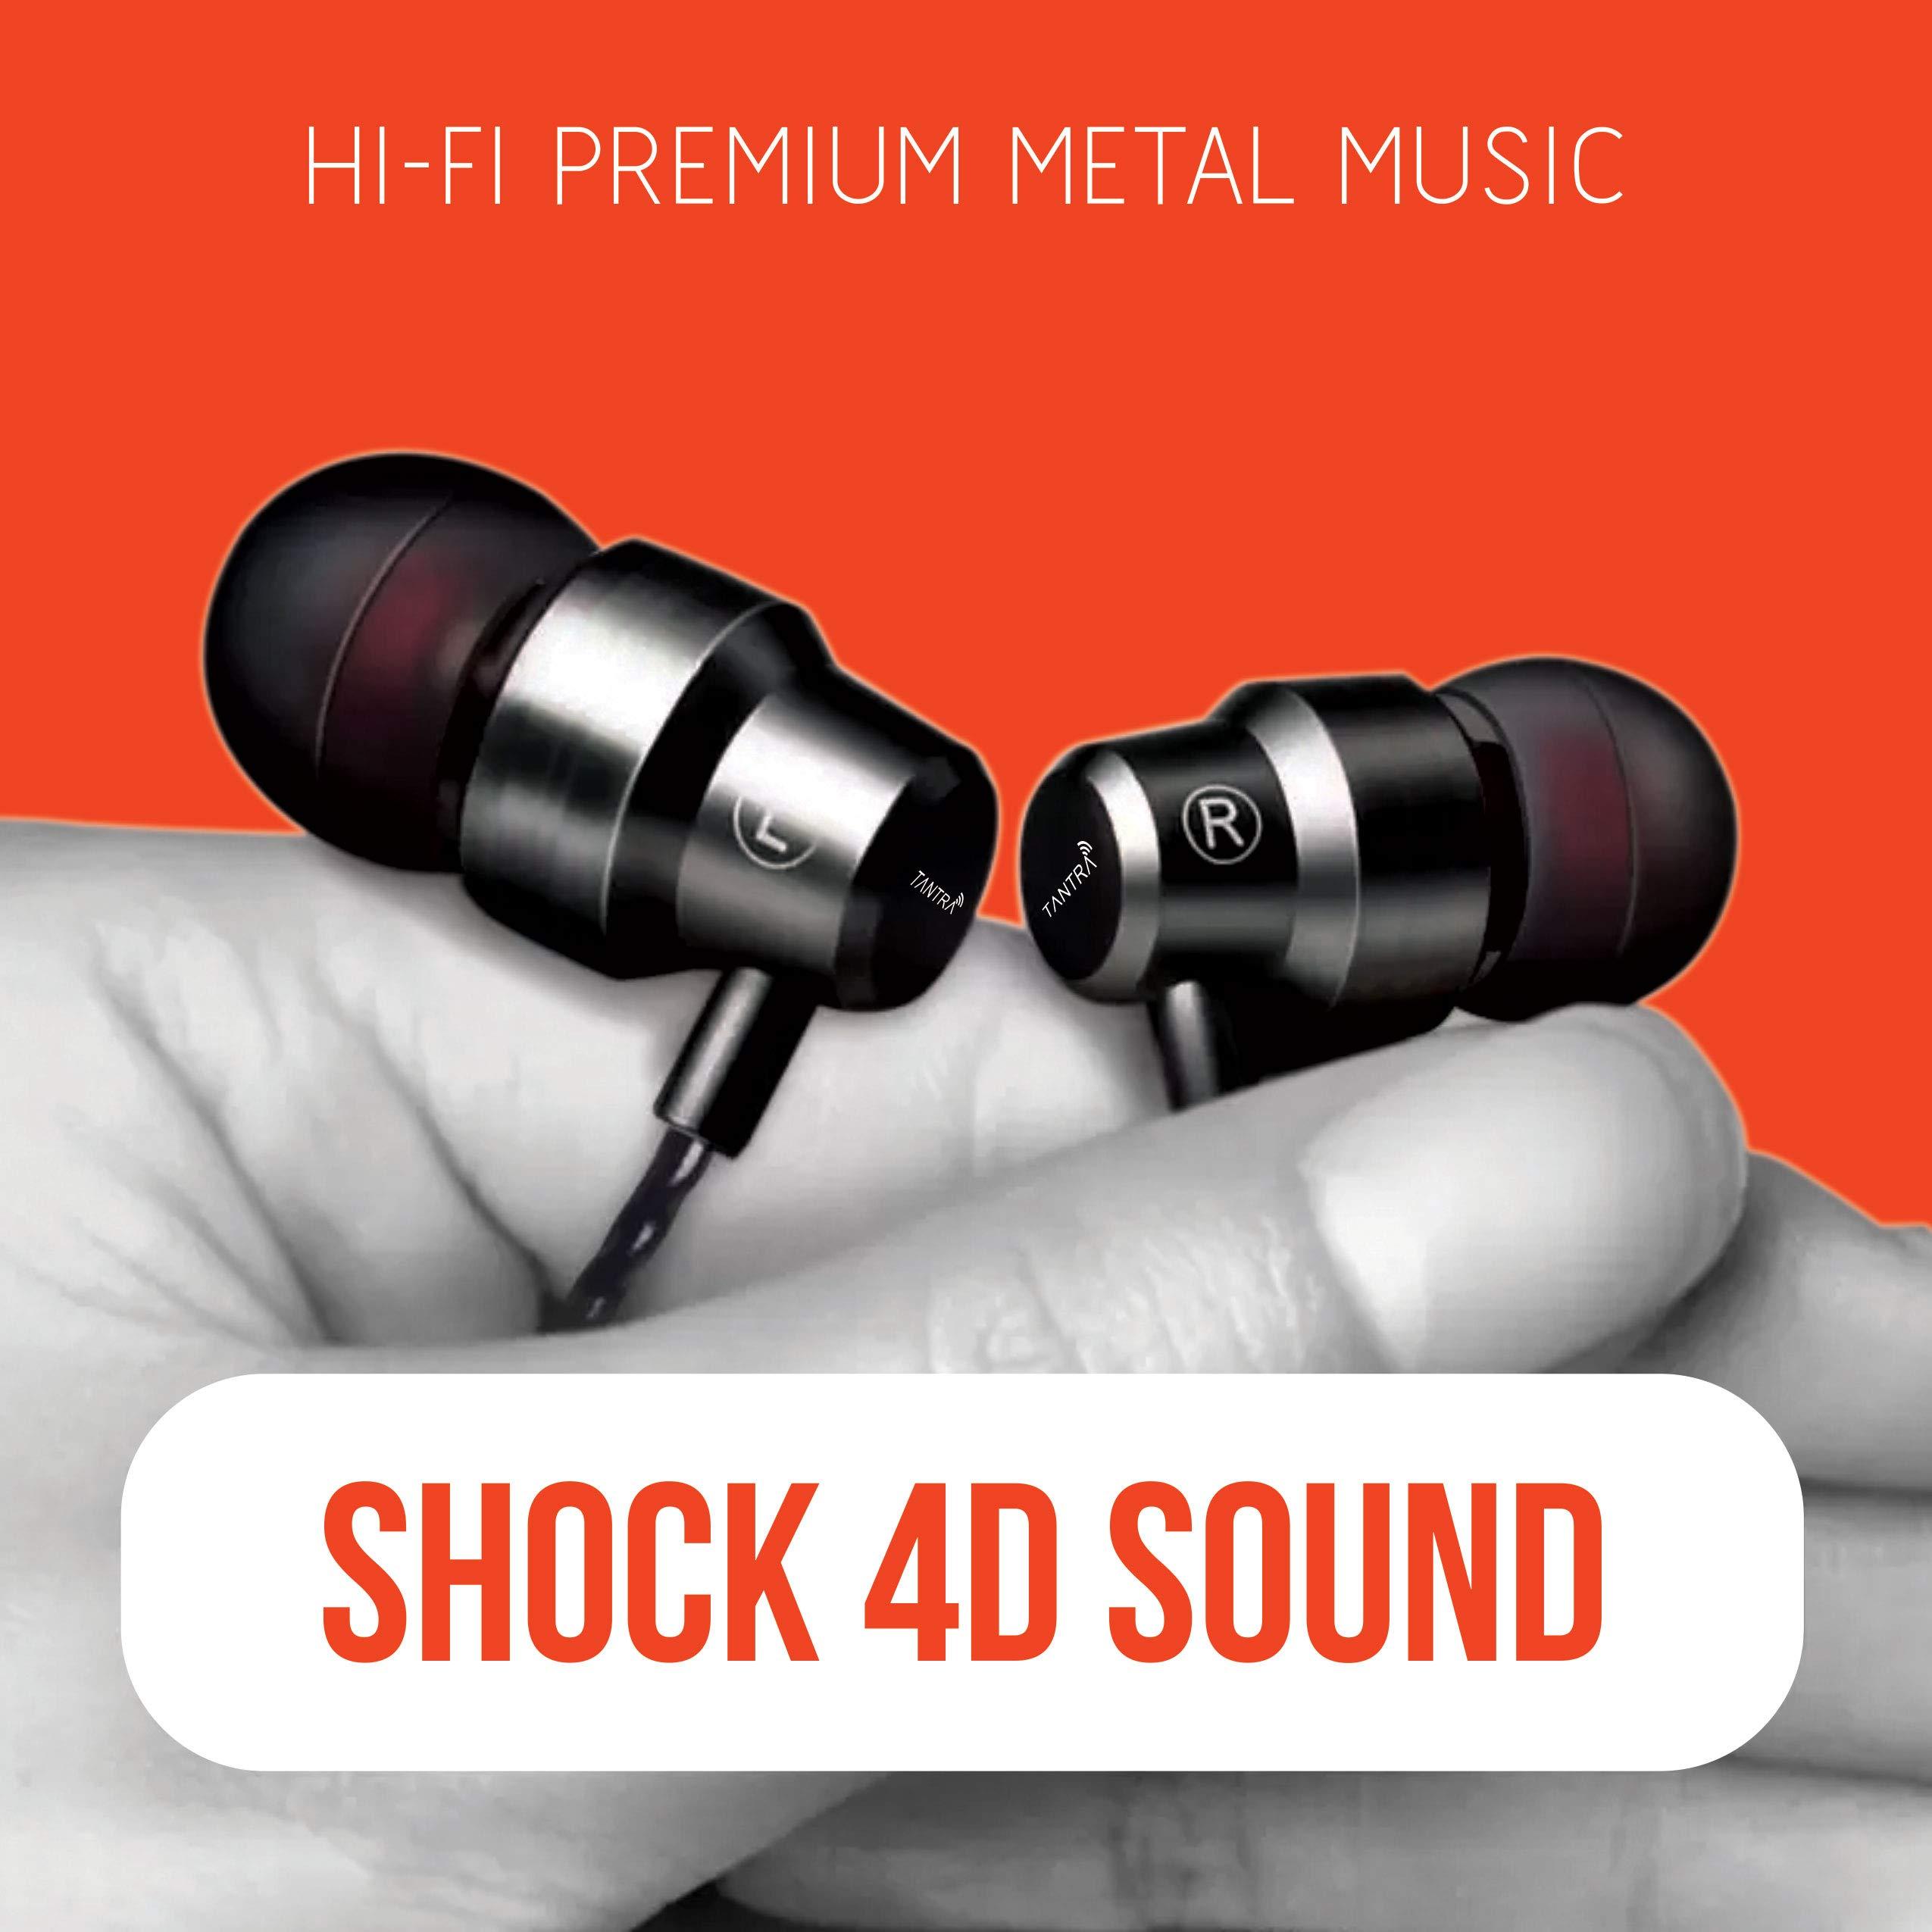 4d Sound Headphones